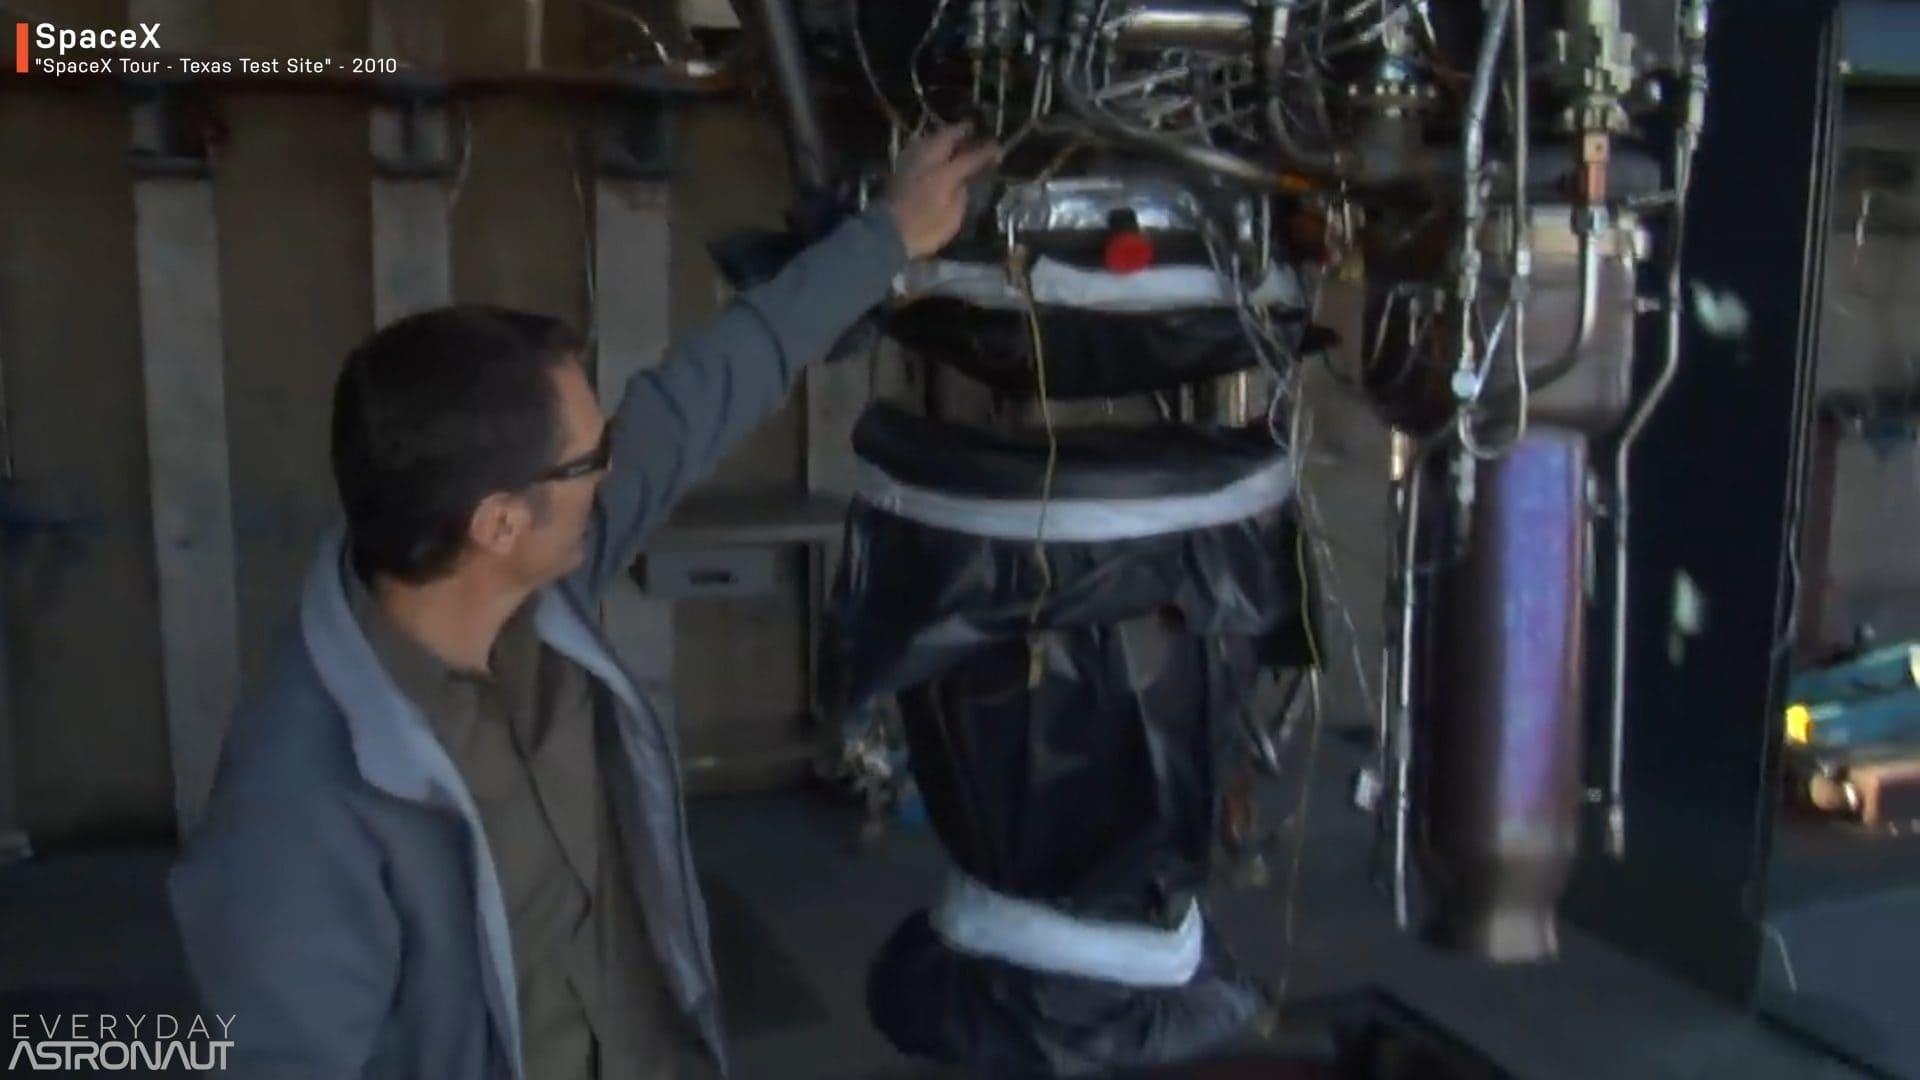 Tom Mueller SpaceX Tom Mueller McGregor